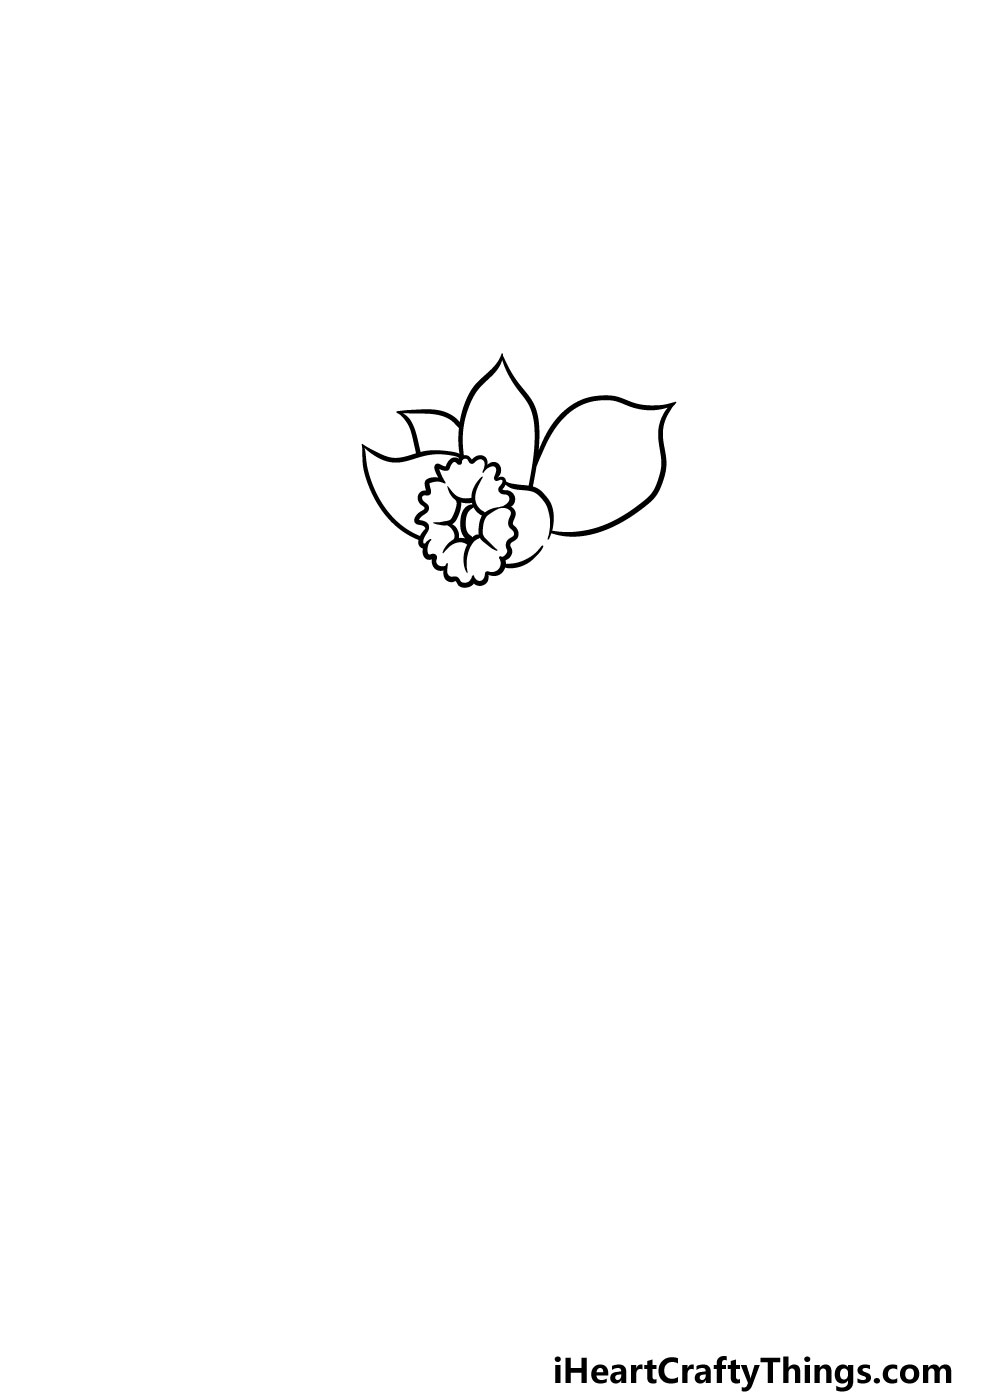 drawing a daffodil step 2